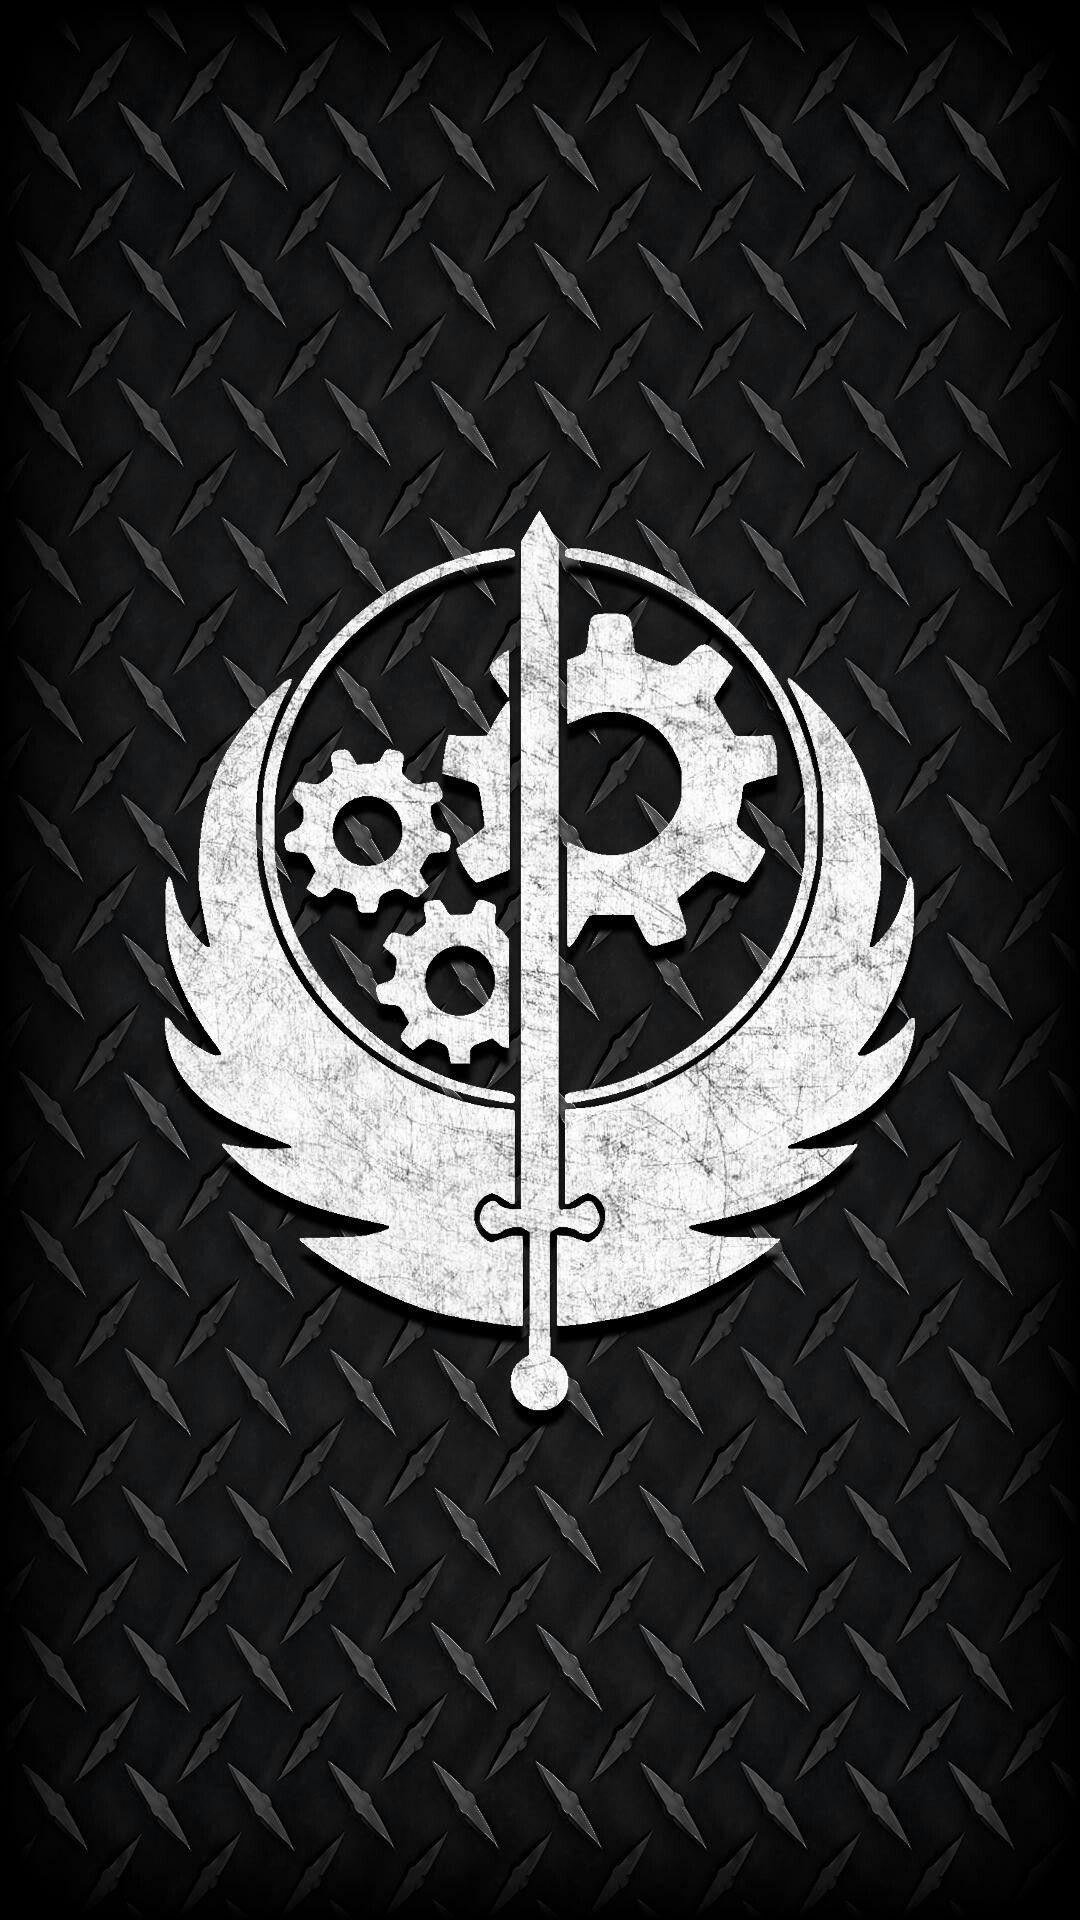 Pin by LoneWanderer on Fallout Fallout wallpaper